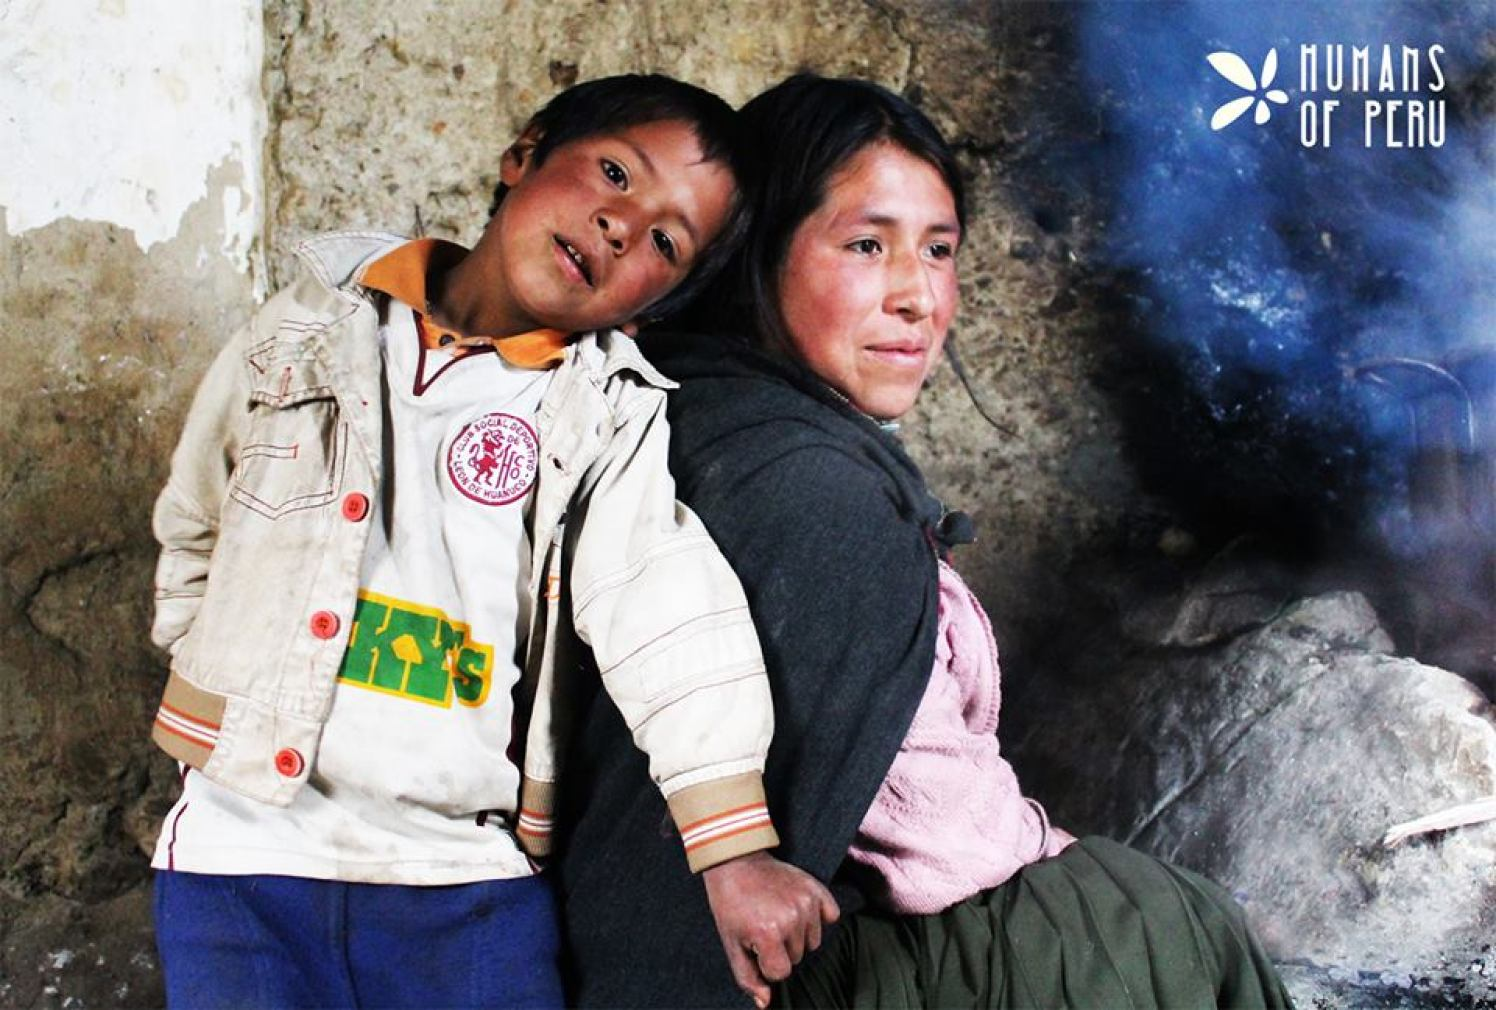 Humans of Peru